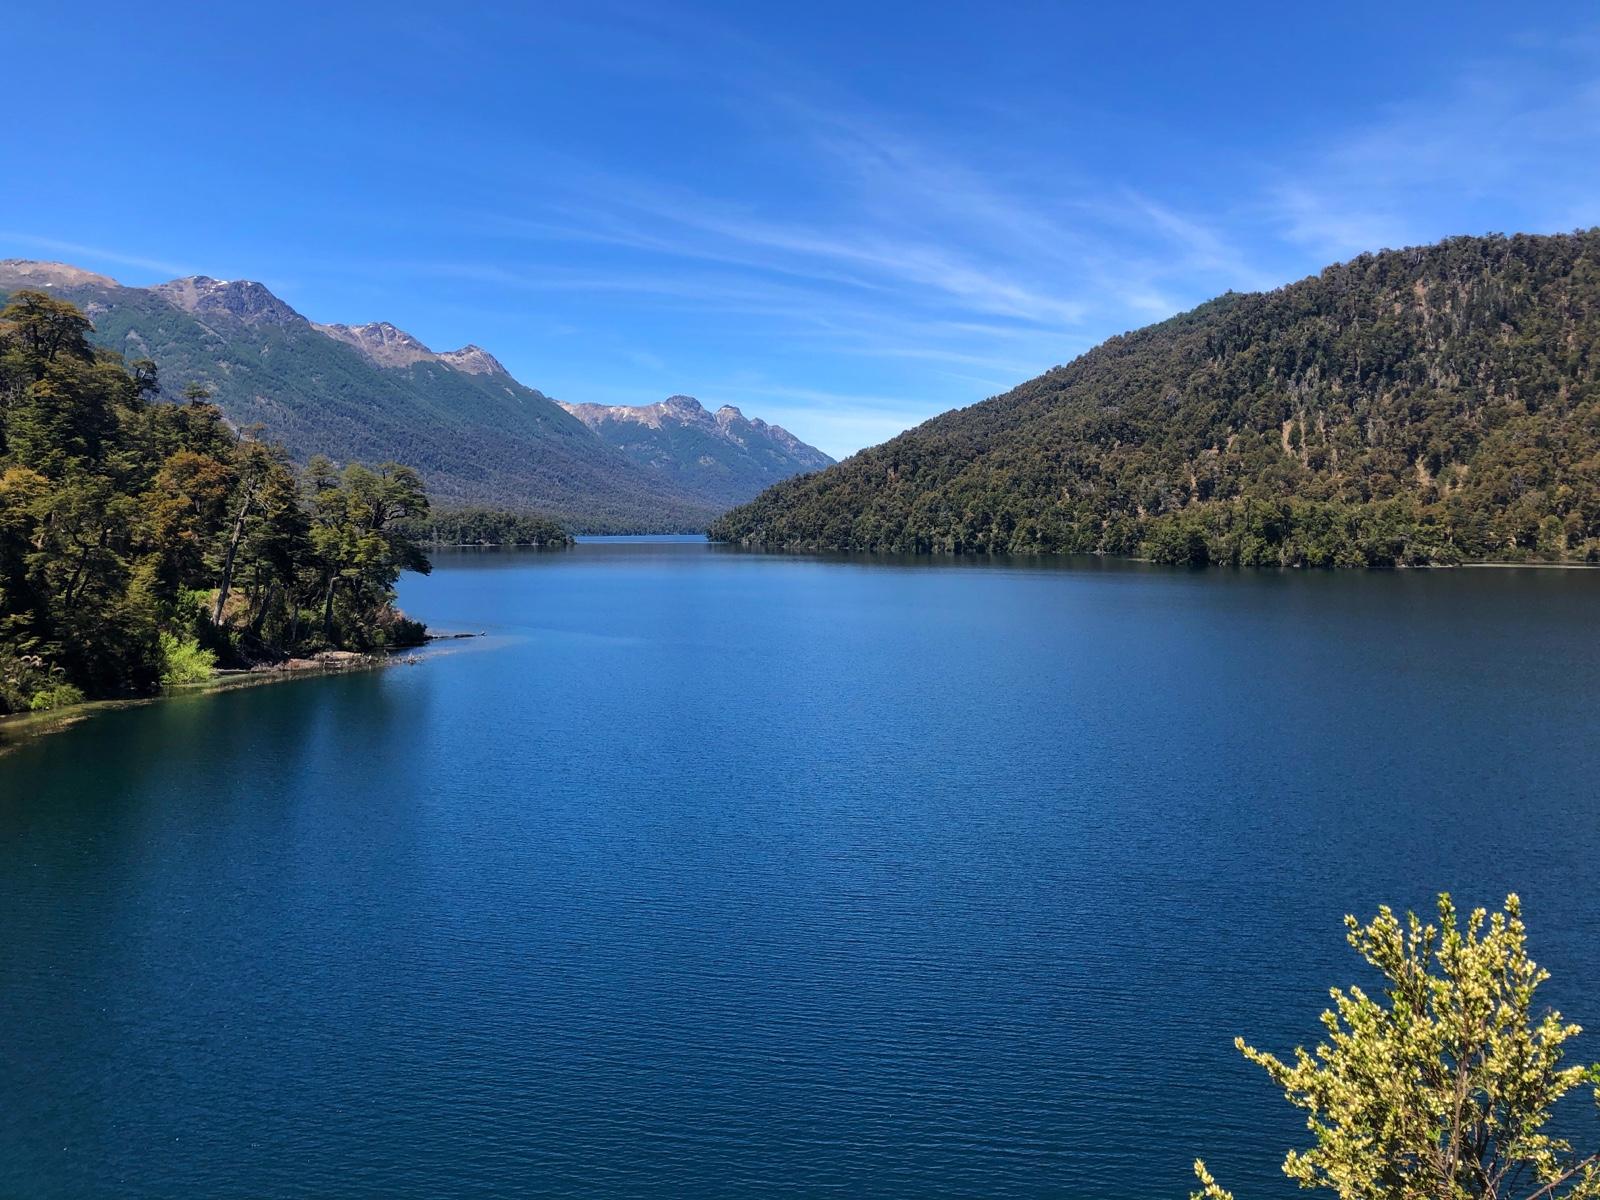 Lago Correntoso